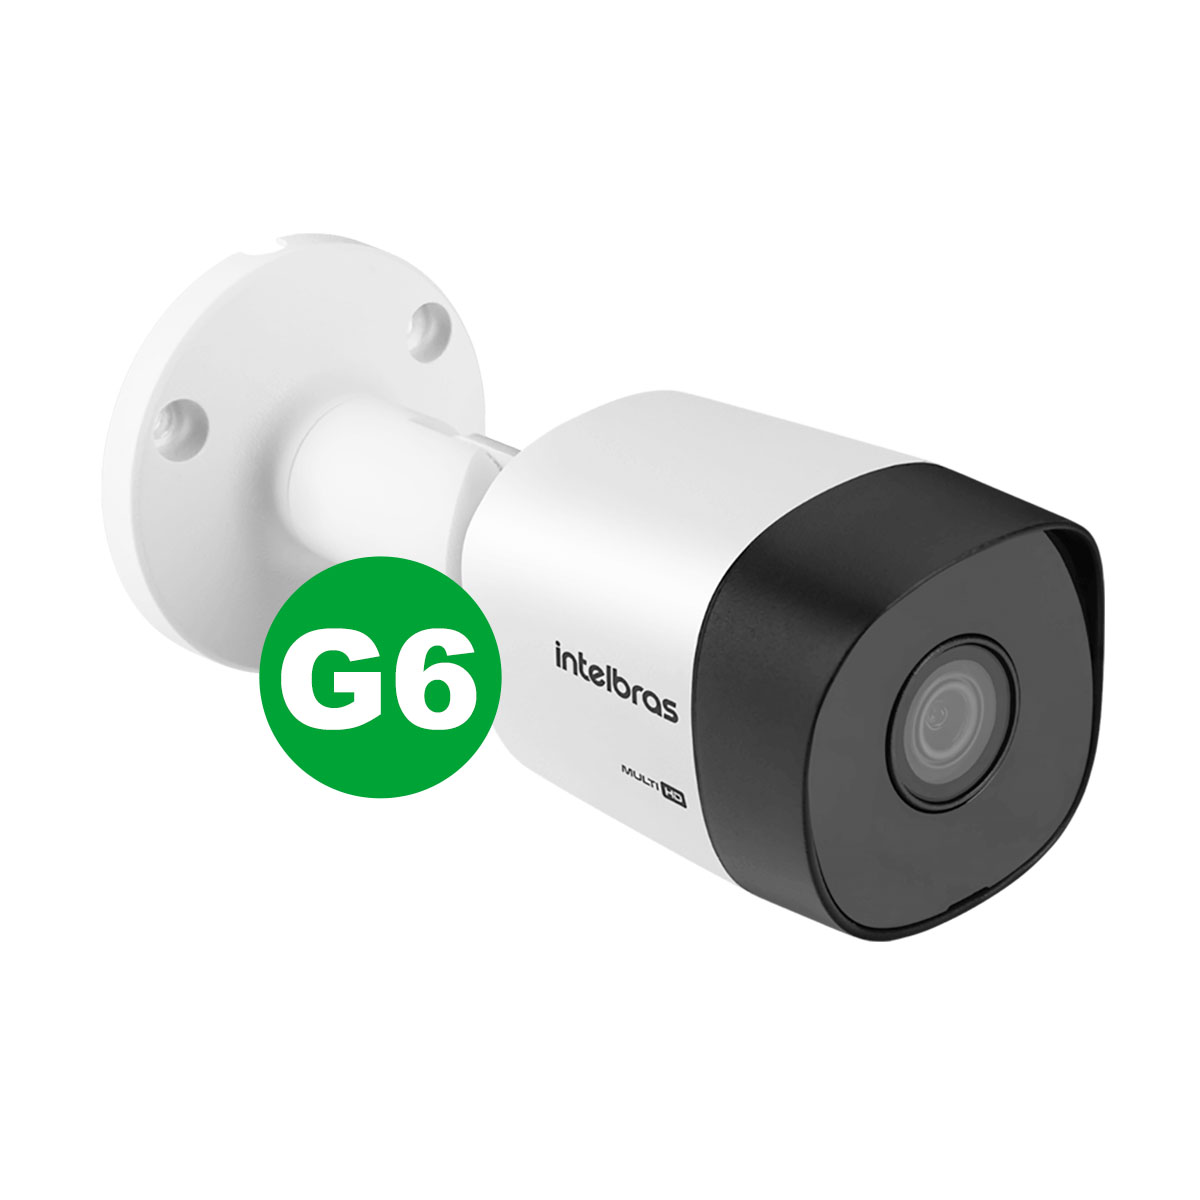 Kit Câmera Bullet Intelbras Vhd 3130 B G6 3,6mm + Acessórios